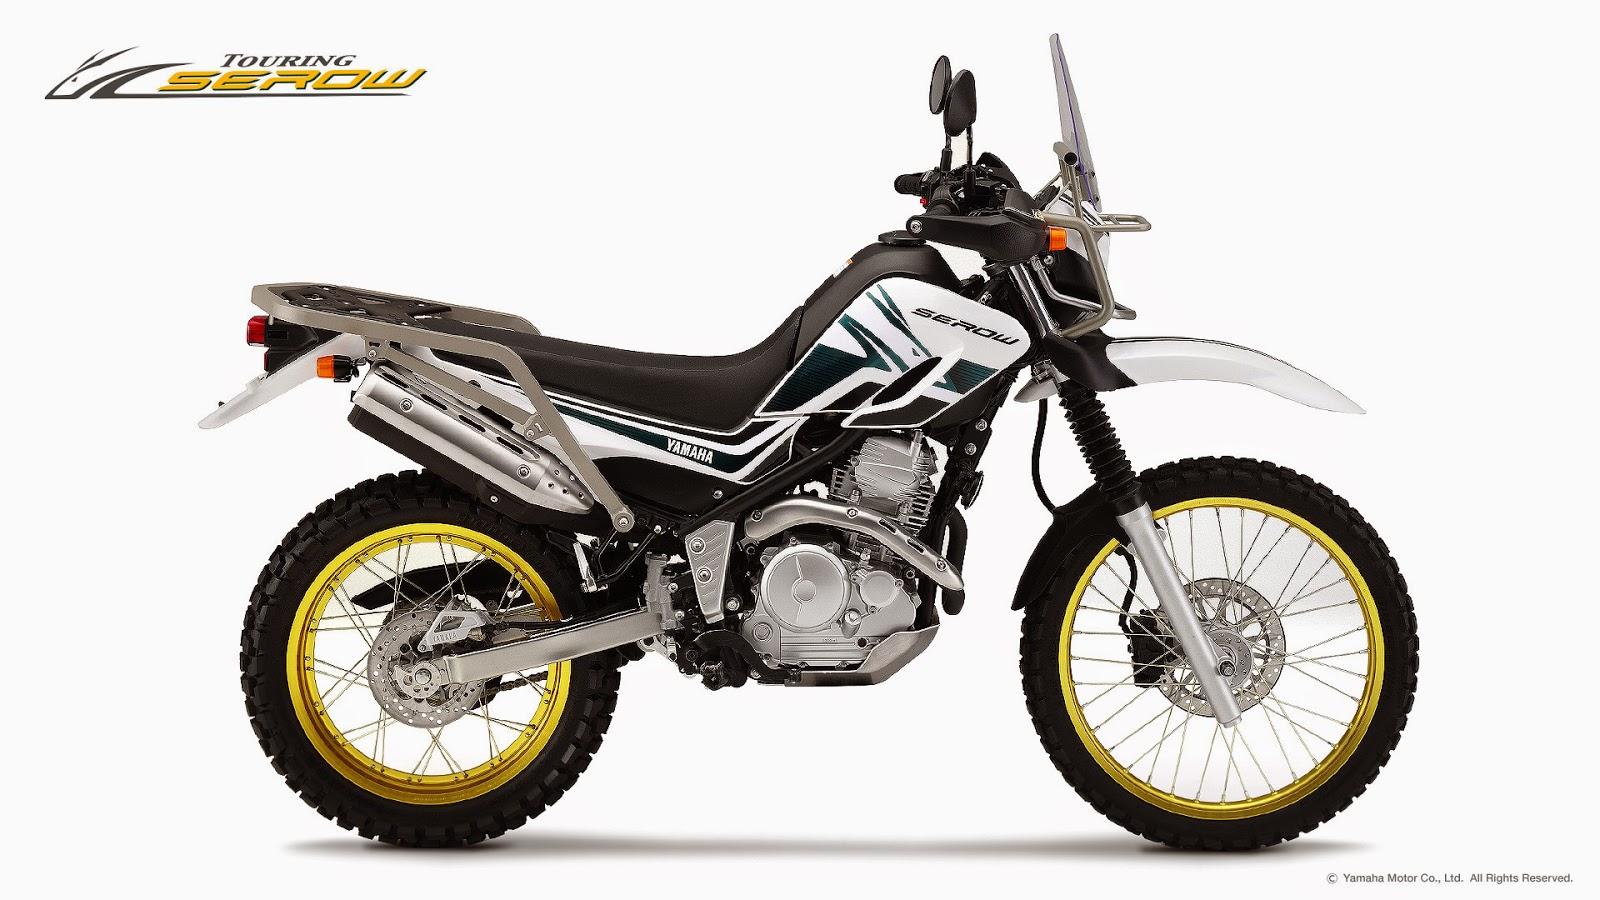 Planet Japan Blog Yamaha Touring Serow 250 2015